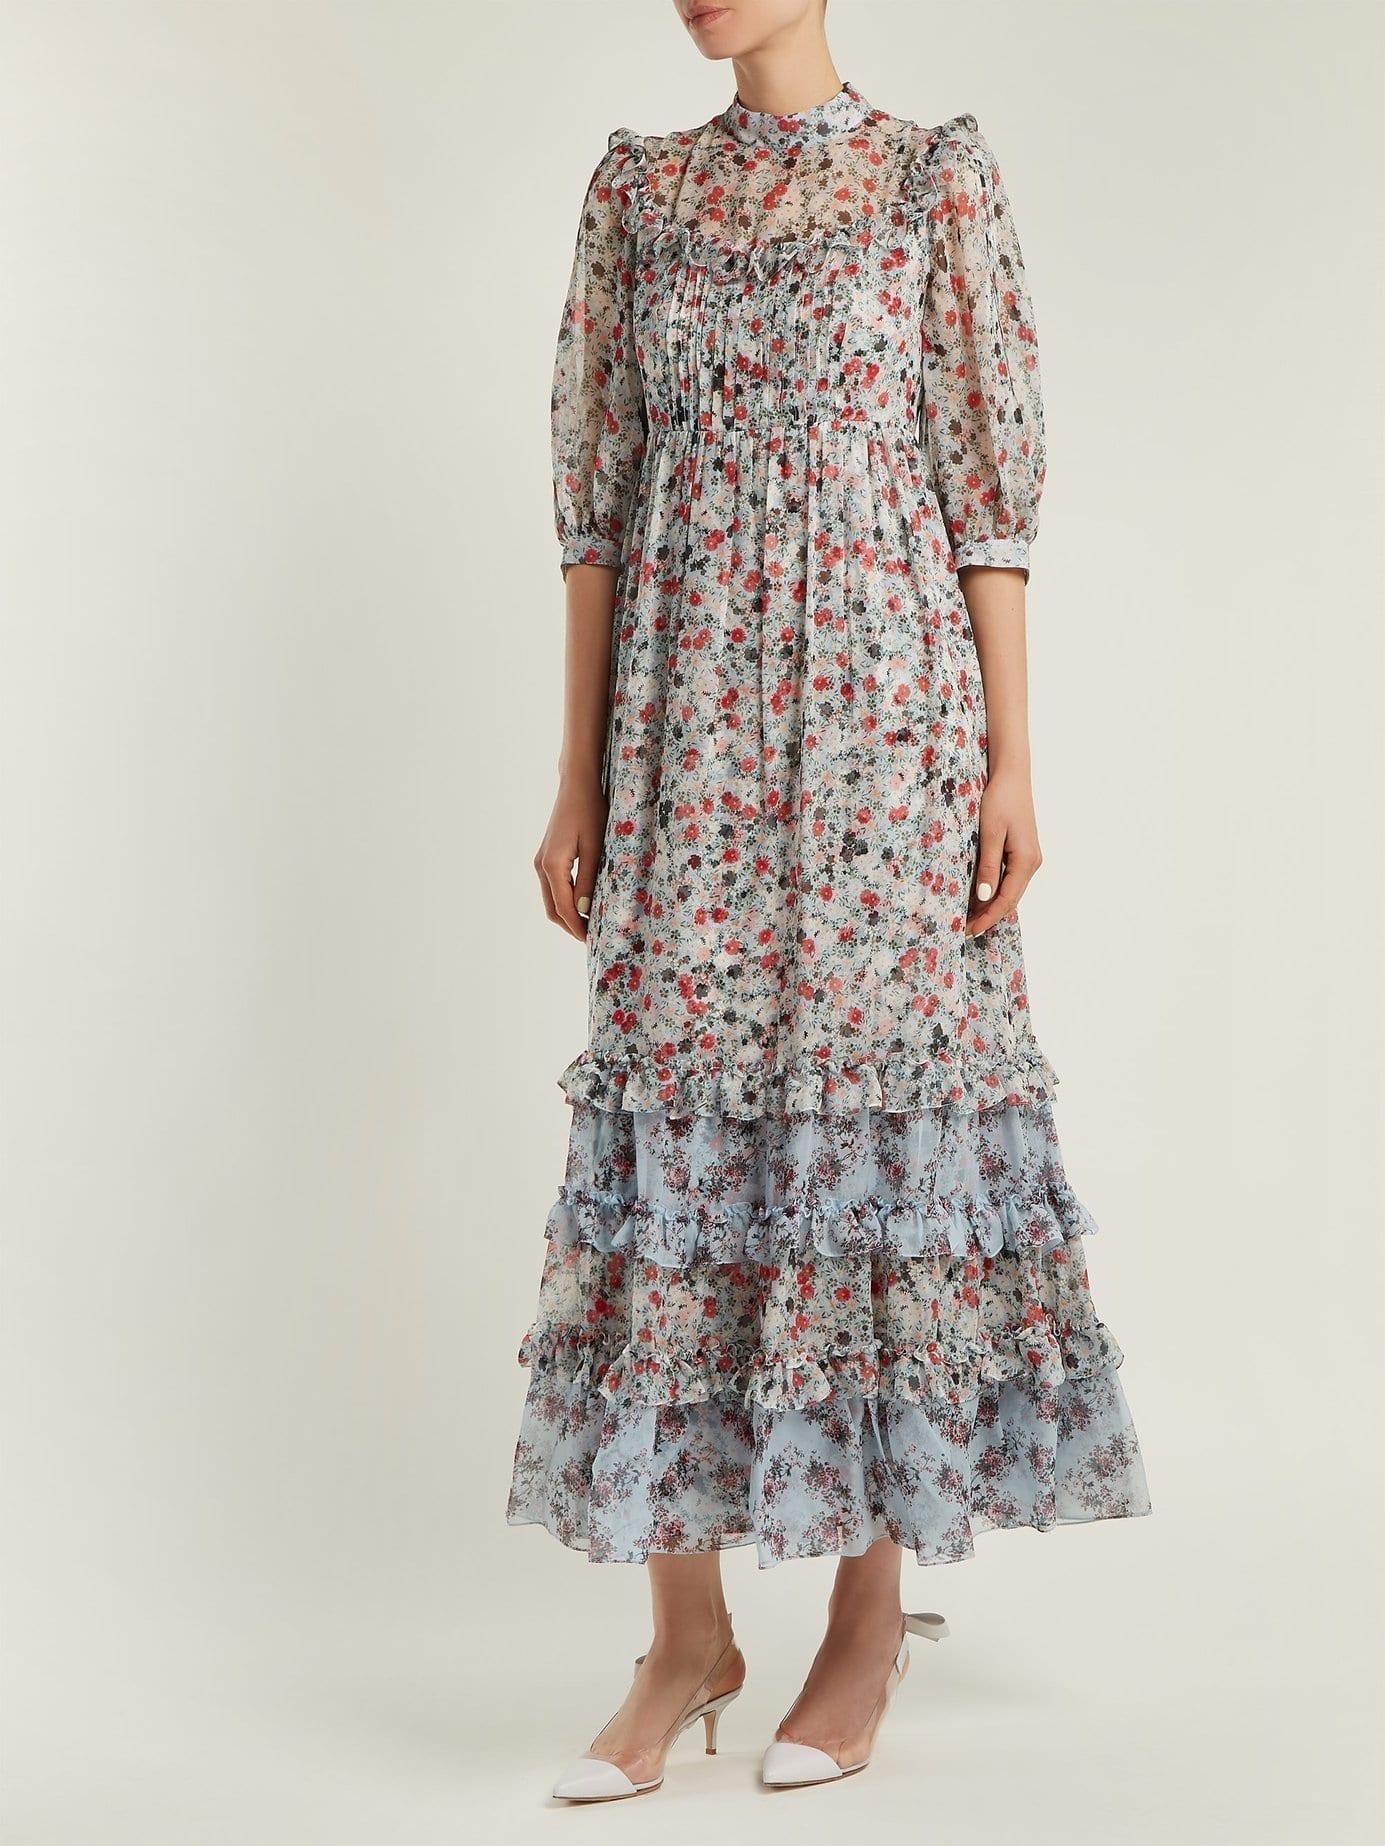 ERDEM Tricia Keiko Disty Print Silk Voile Multicolored Dress